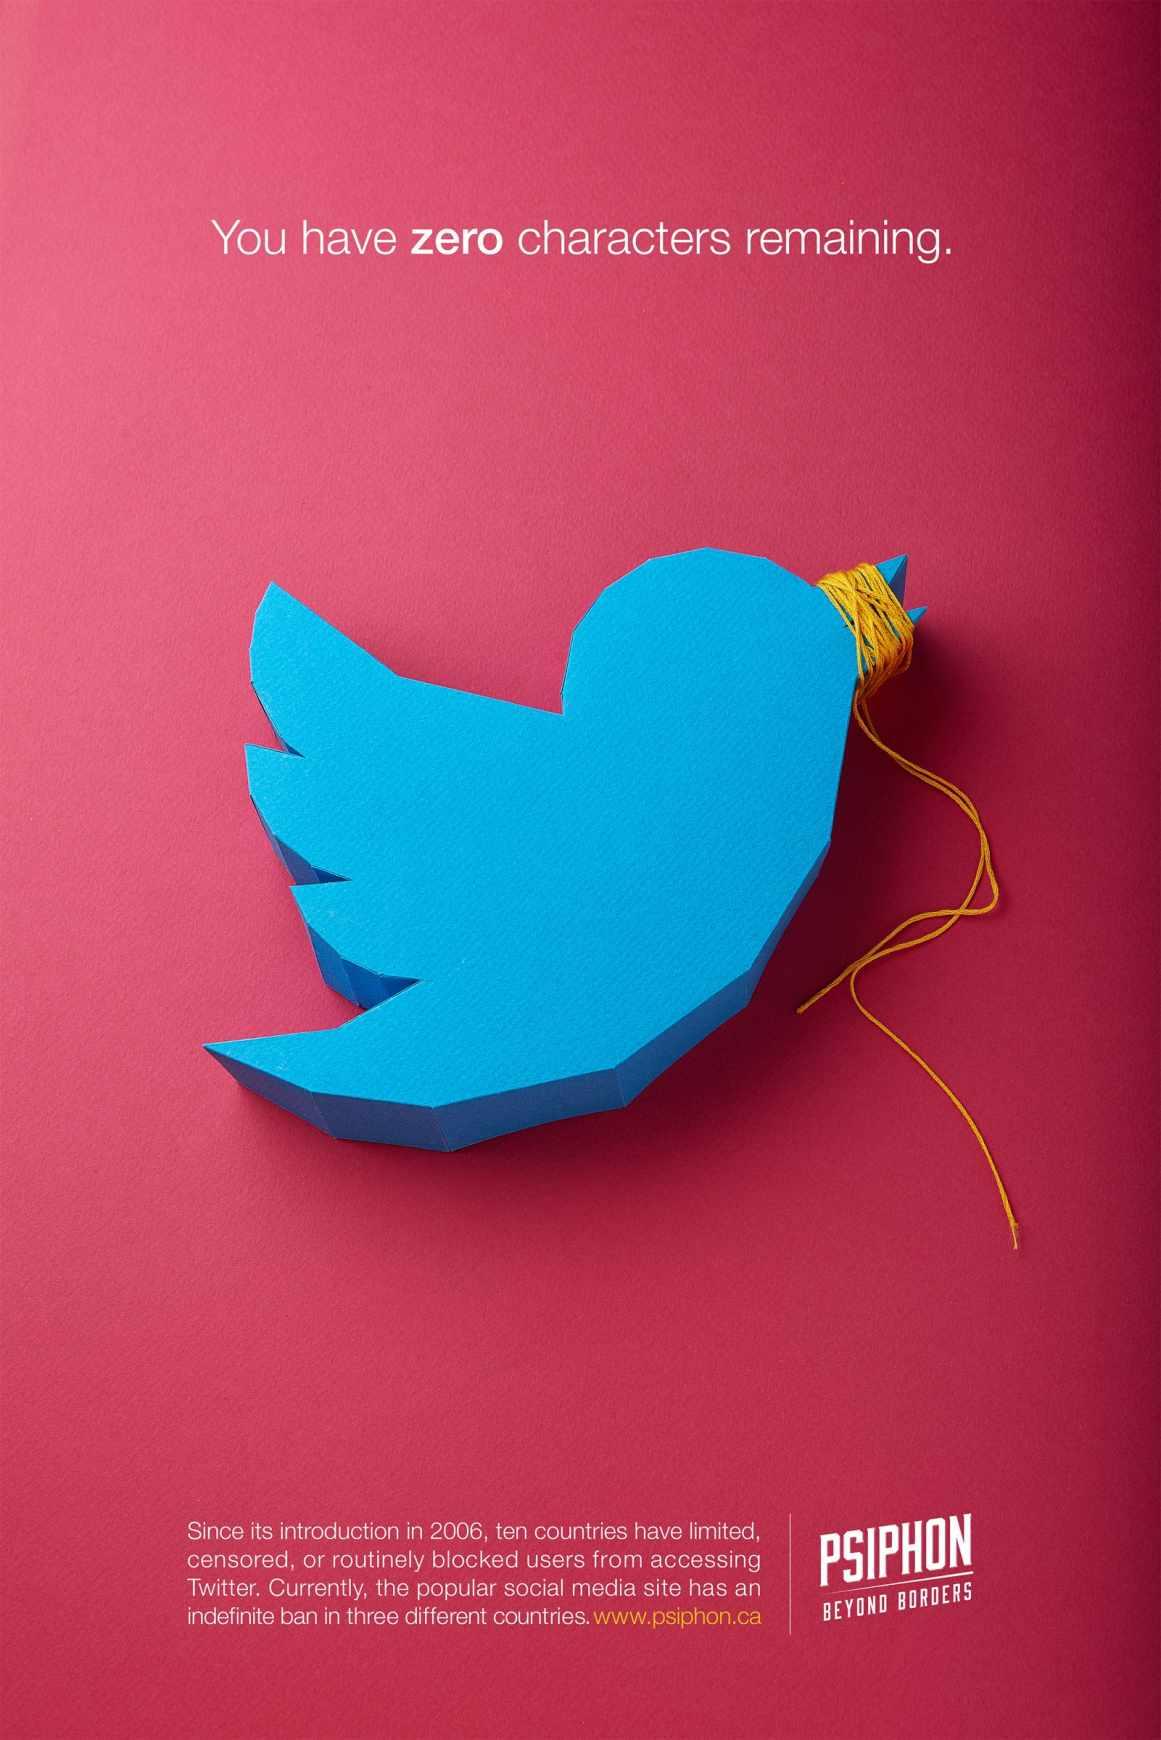 dans-ta-pub-social-media-censure-liberte-expression-psiphon-2